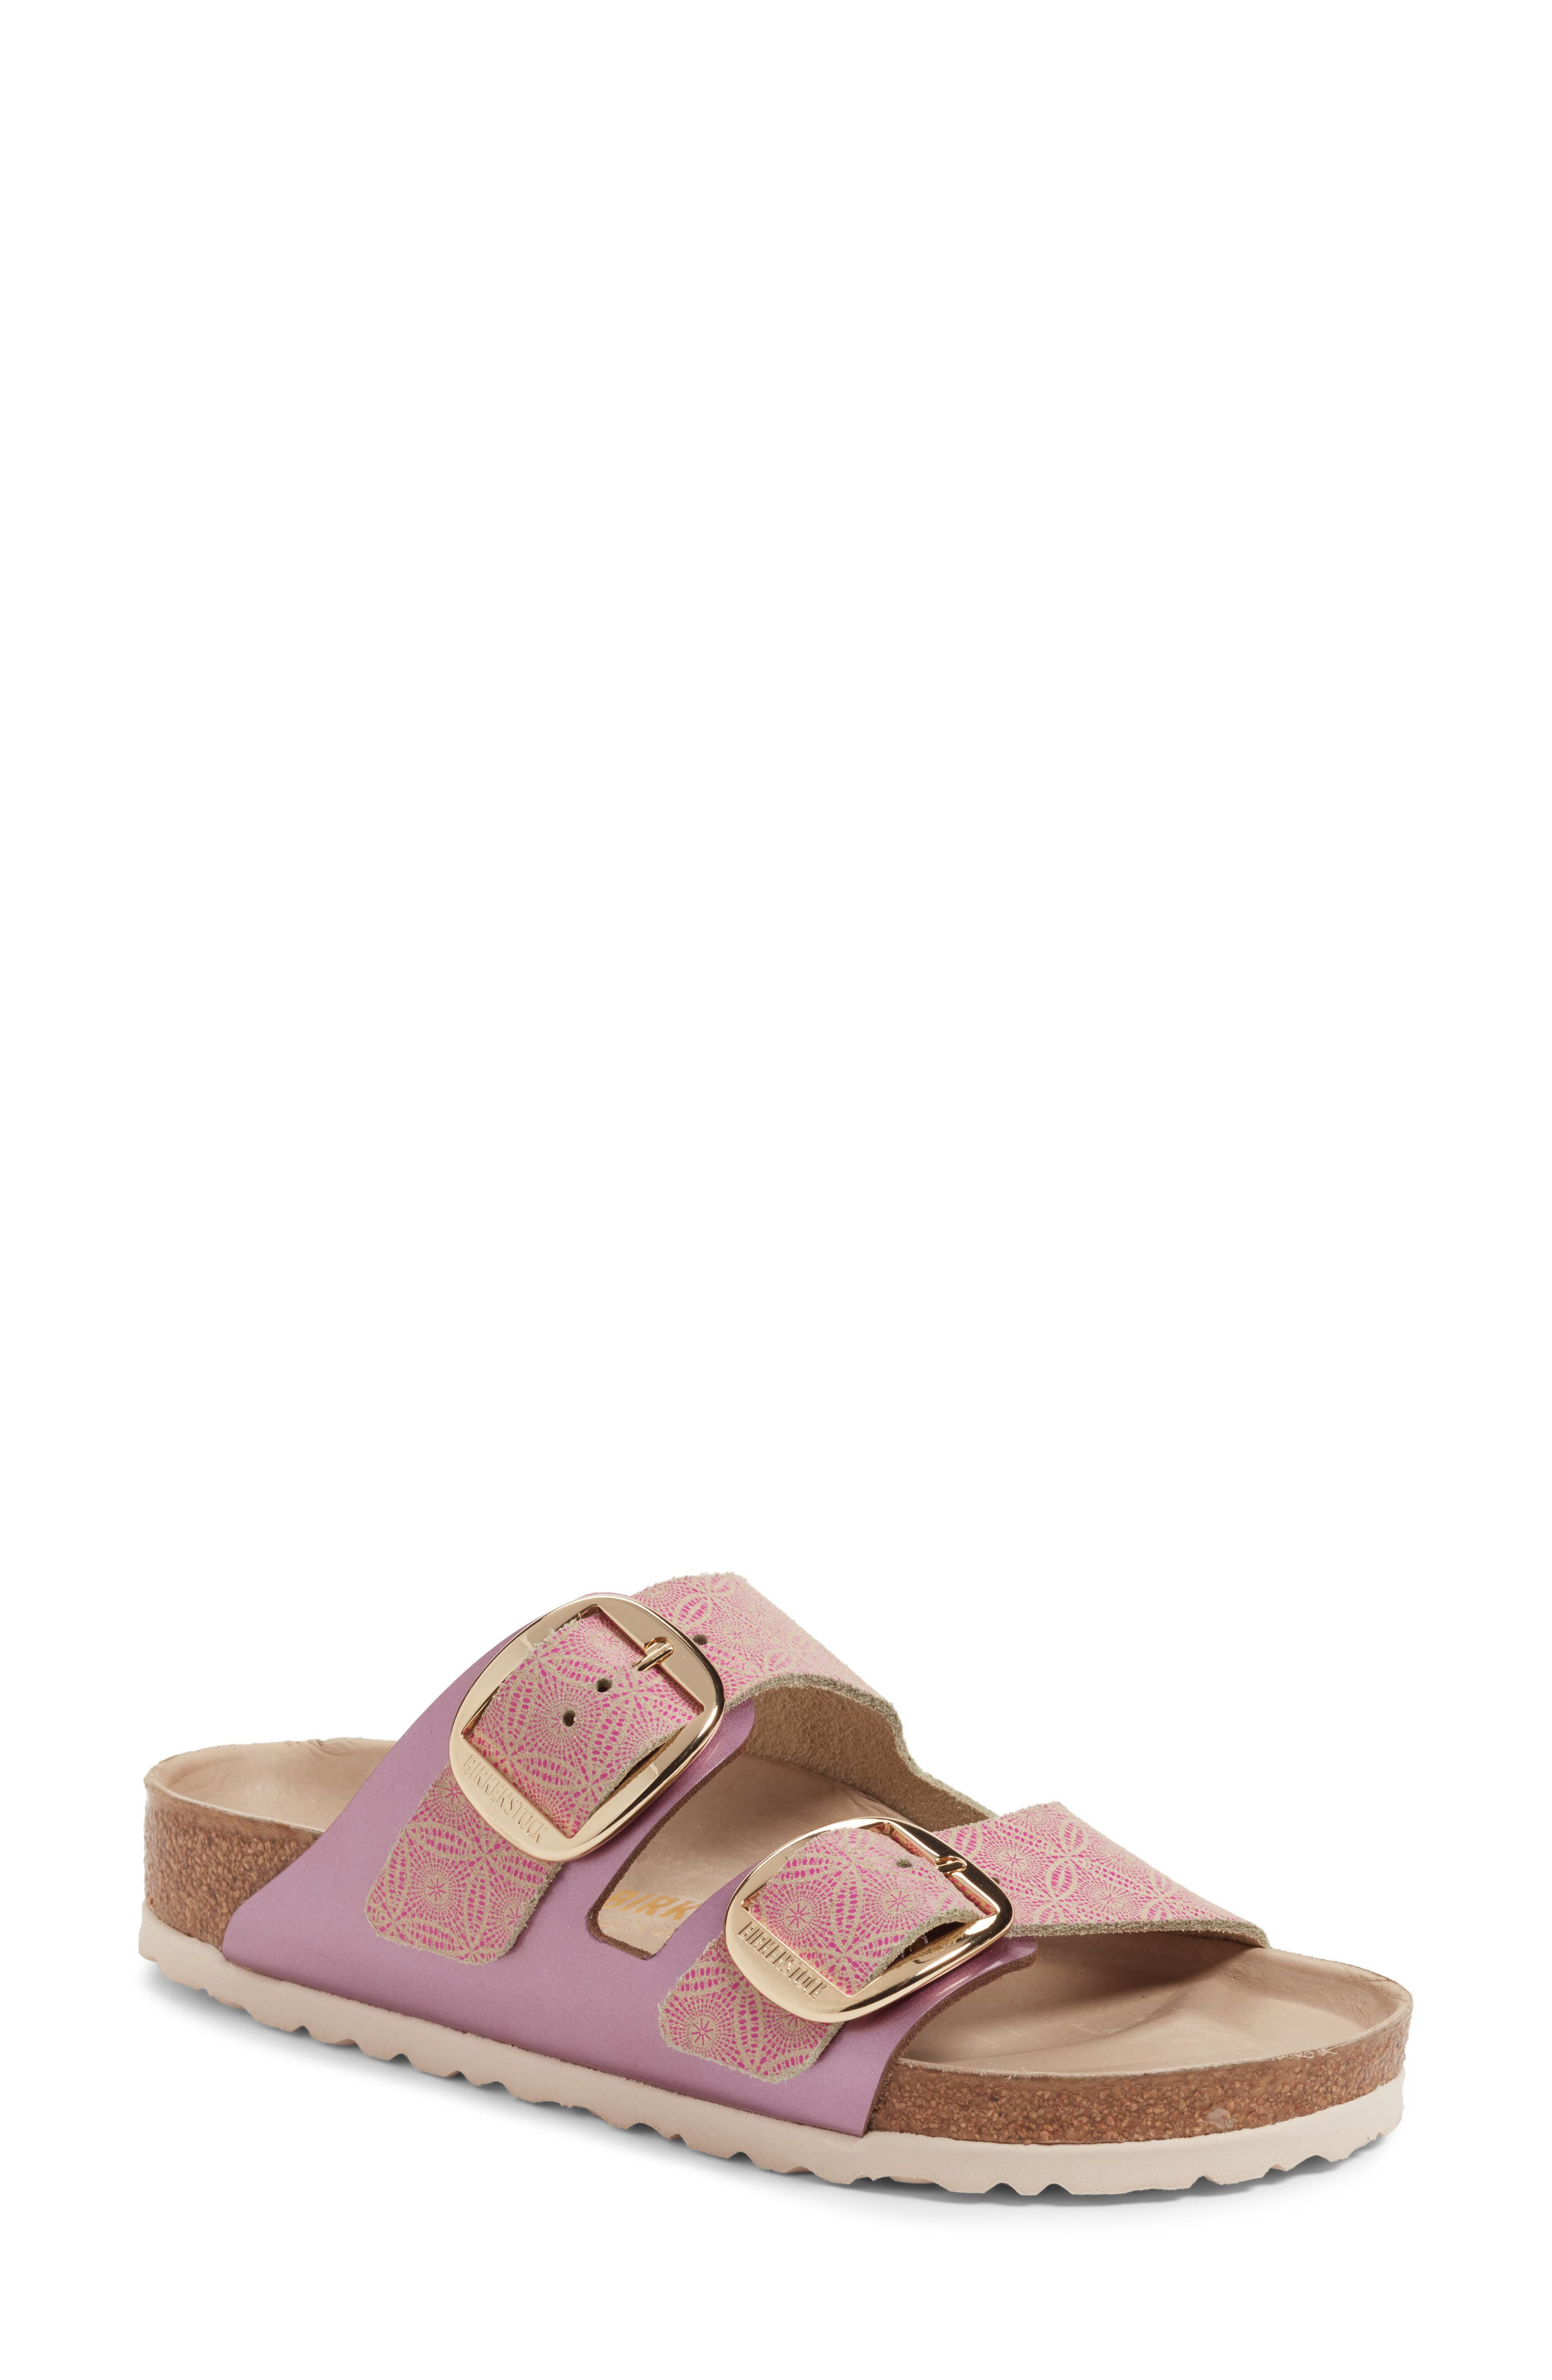 Arizona Big Buckle Slide Sandal,                             Main thumbnail 1, color,                             Ceramic Rose Leather